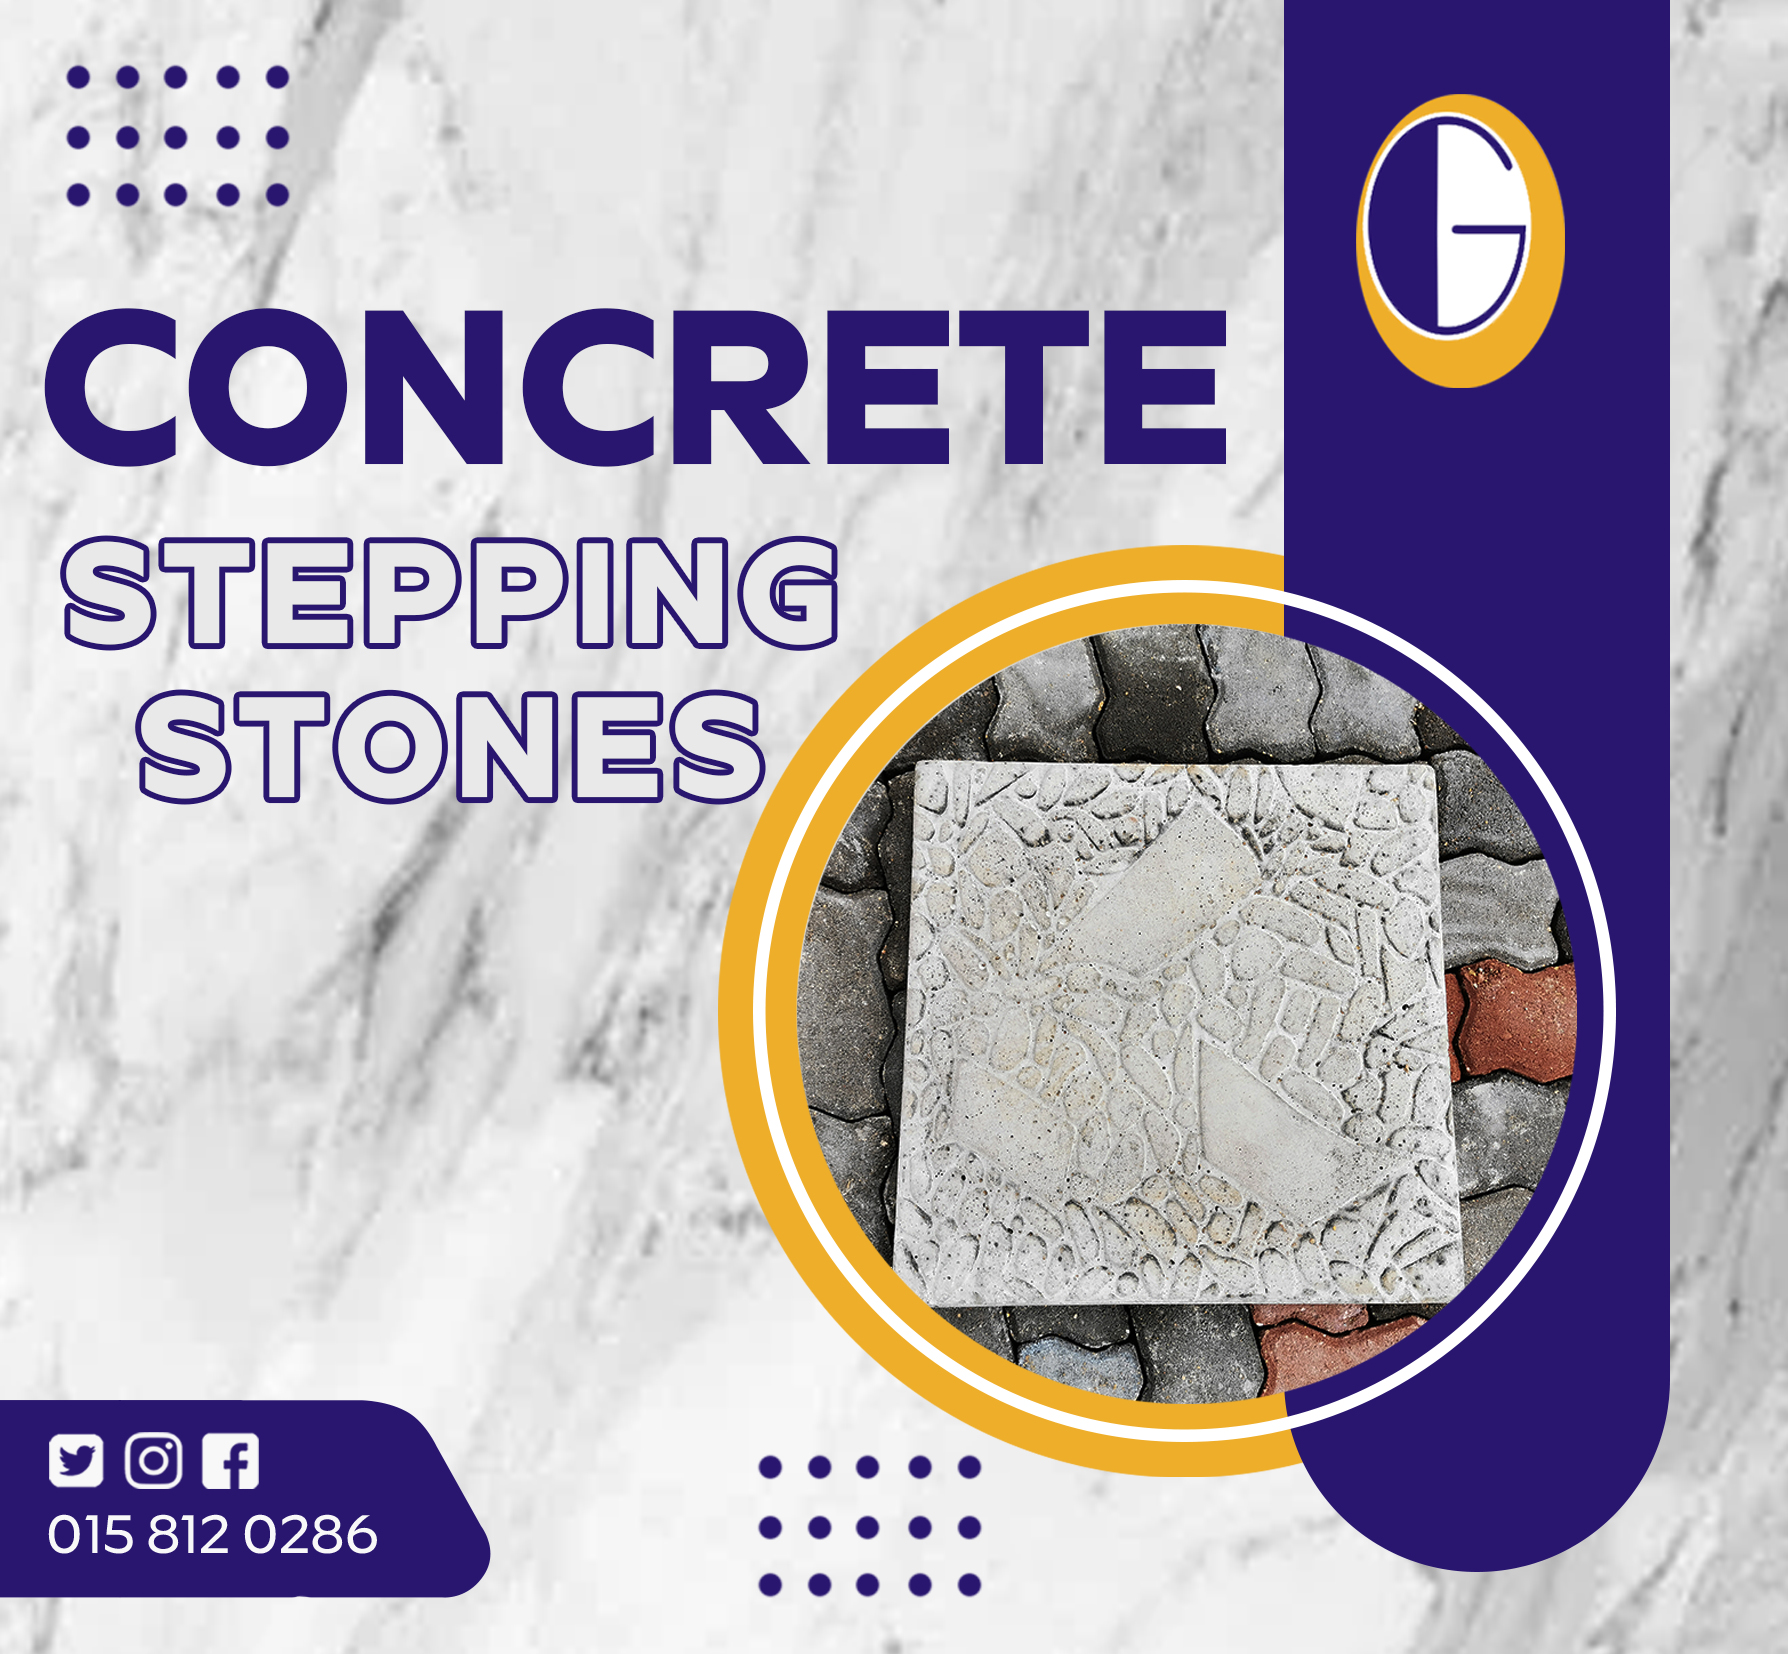 concrete-insta